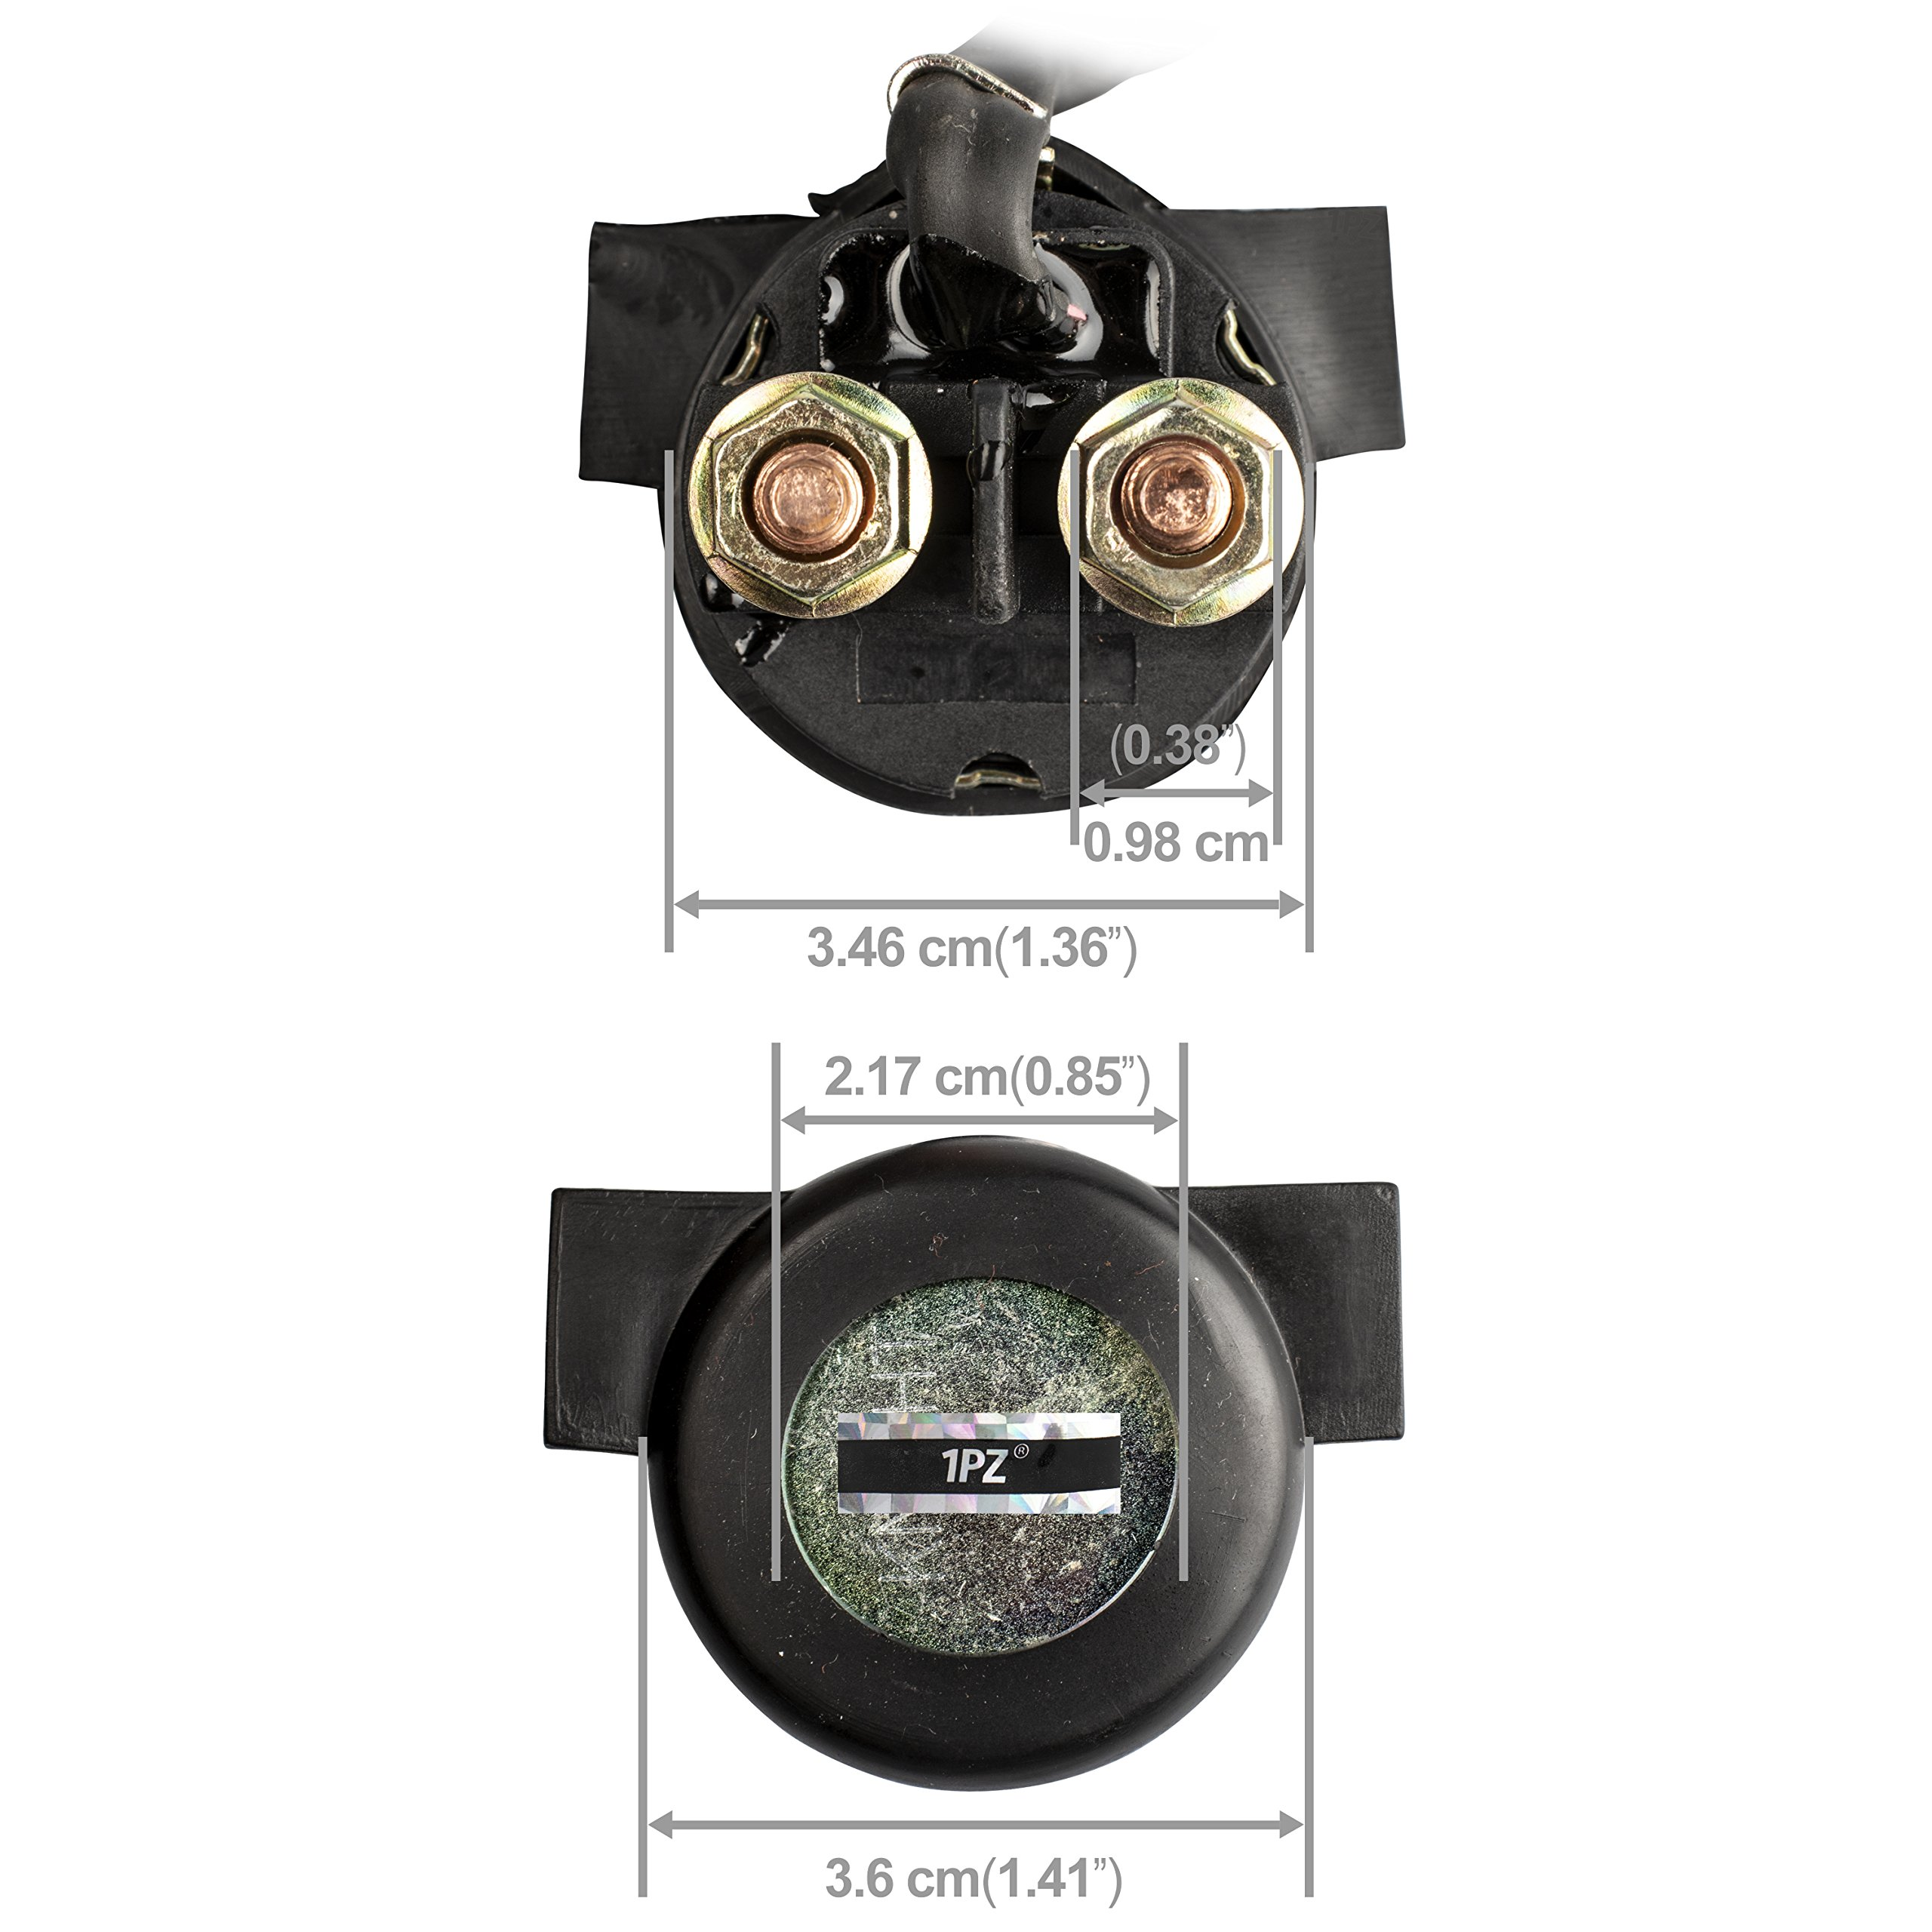 1PZ H25-S01 Premium Starter Solenoid Relay for Honda TRX250EX TRX 250 EX Sportrax 2002 2003 2004 2005 2006 2007 2008 by 1PZ (Image #2)